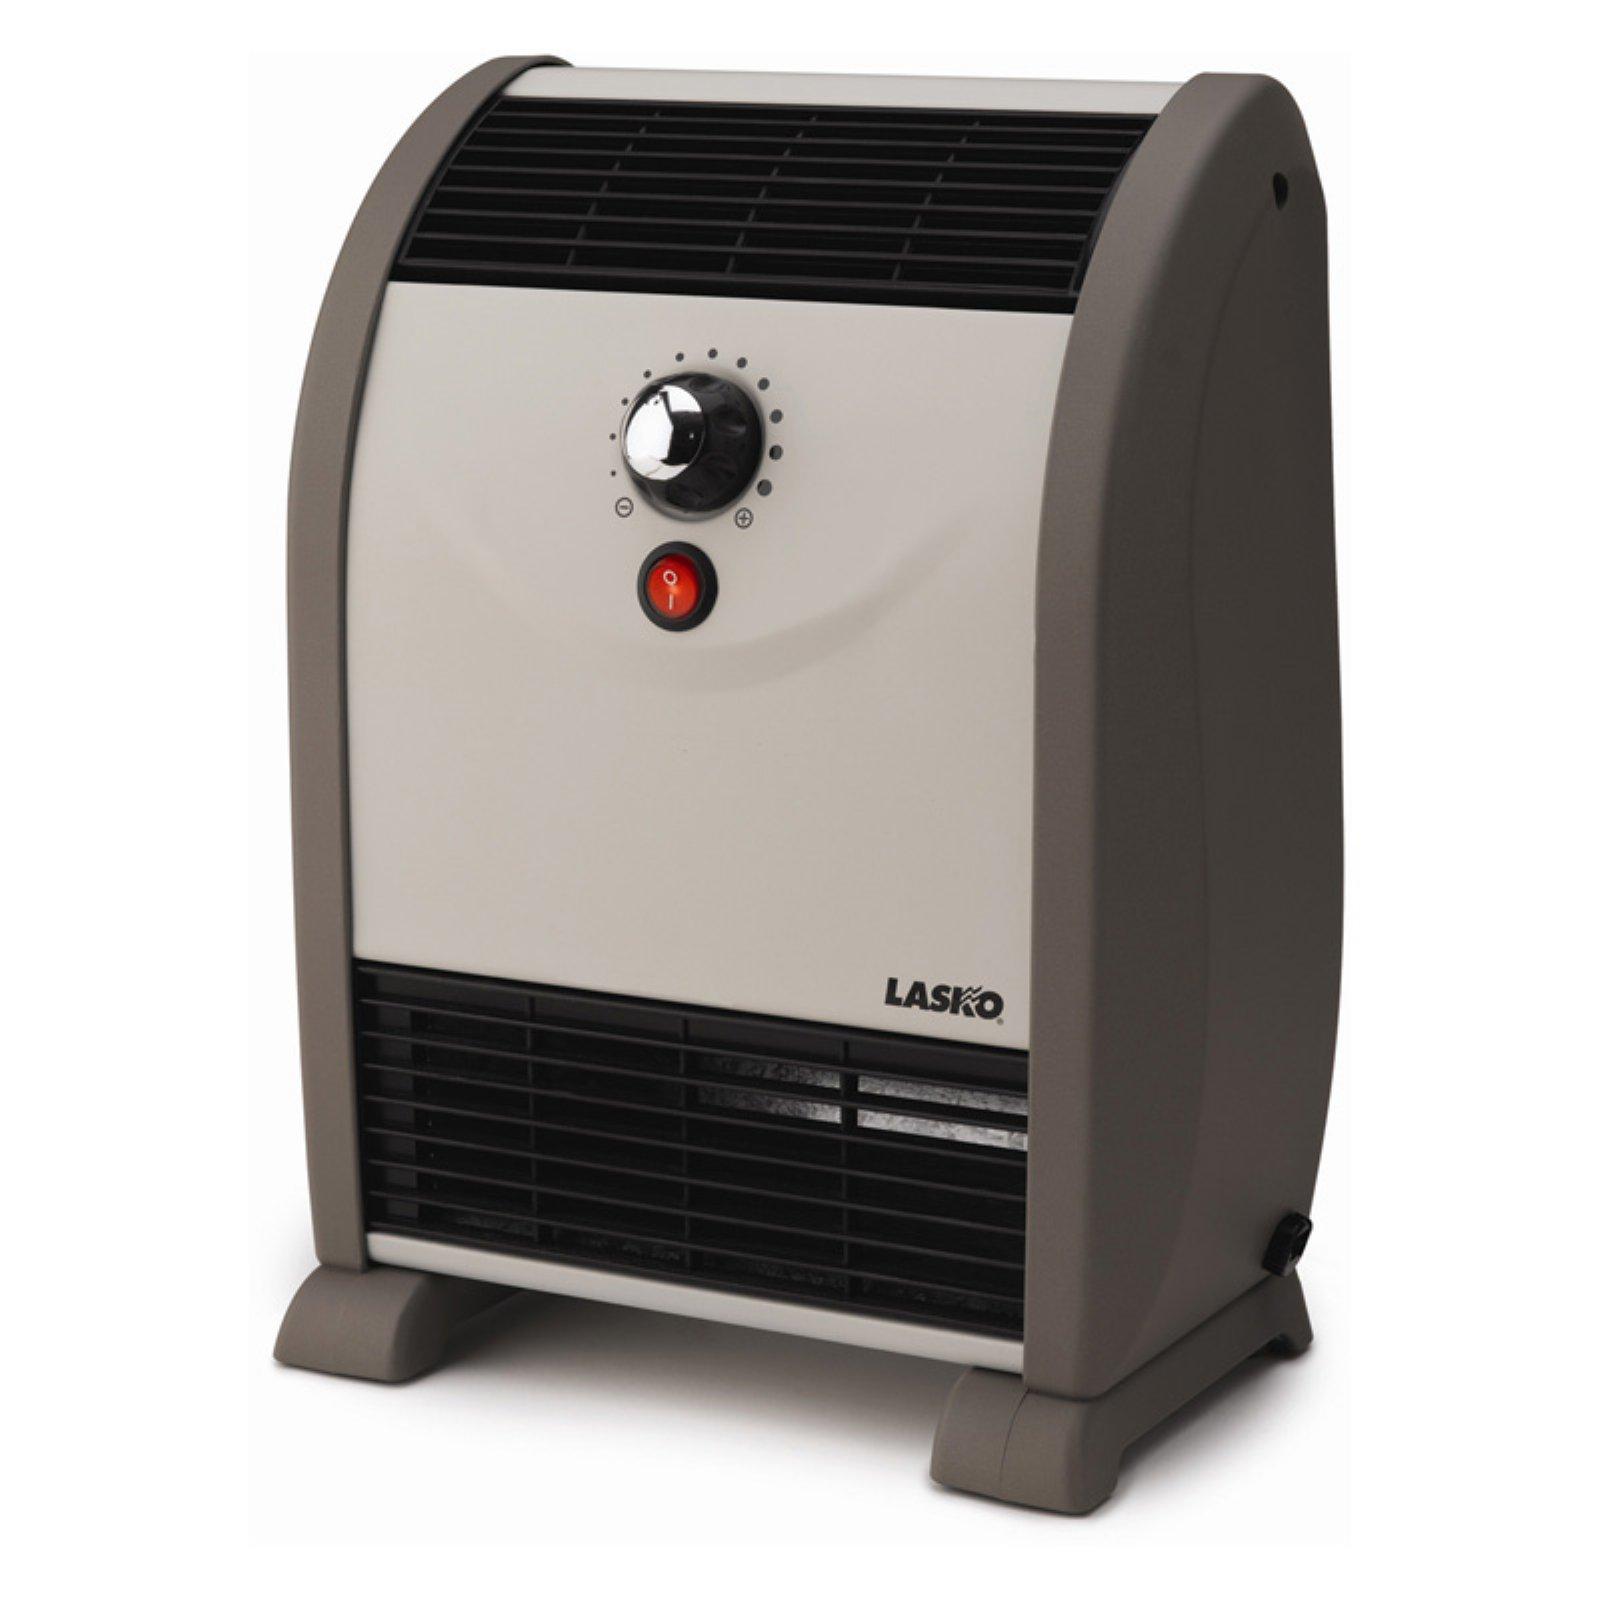 Lasko Automatic Air Flow Heater with Temperature